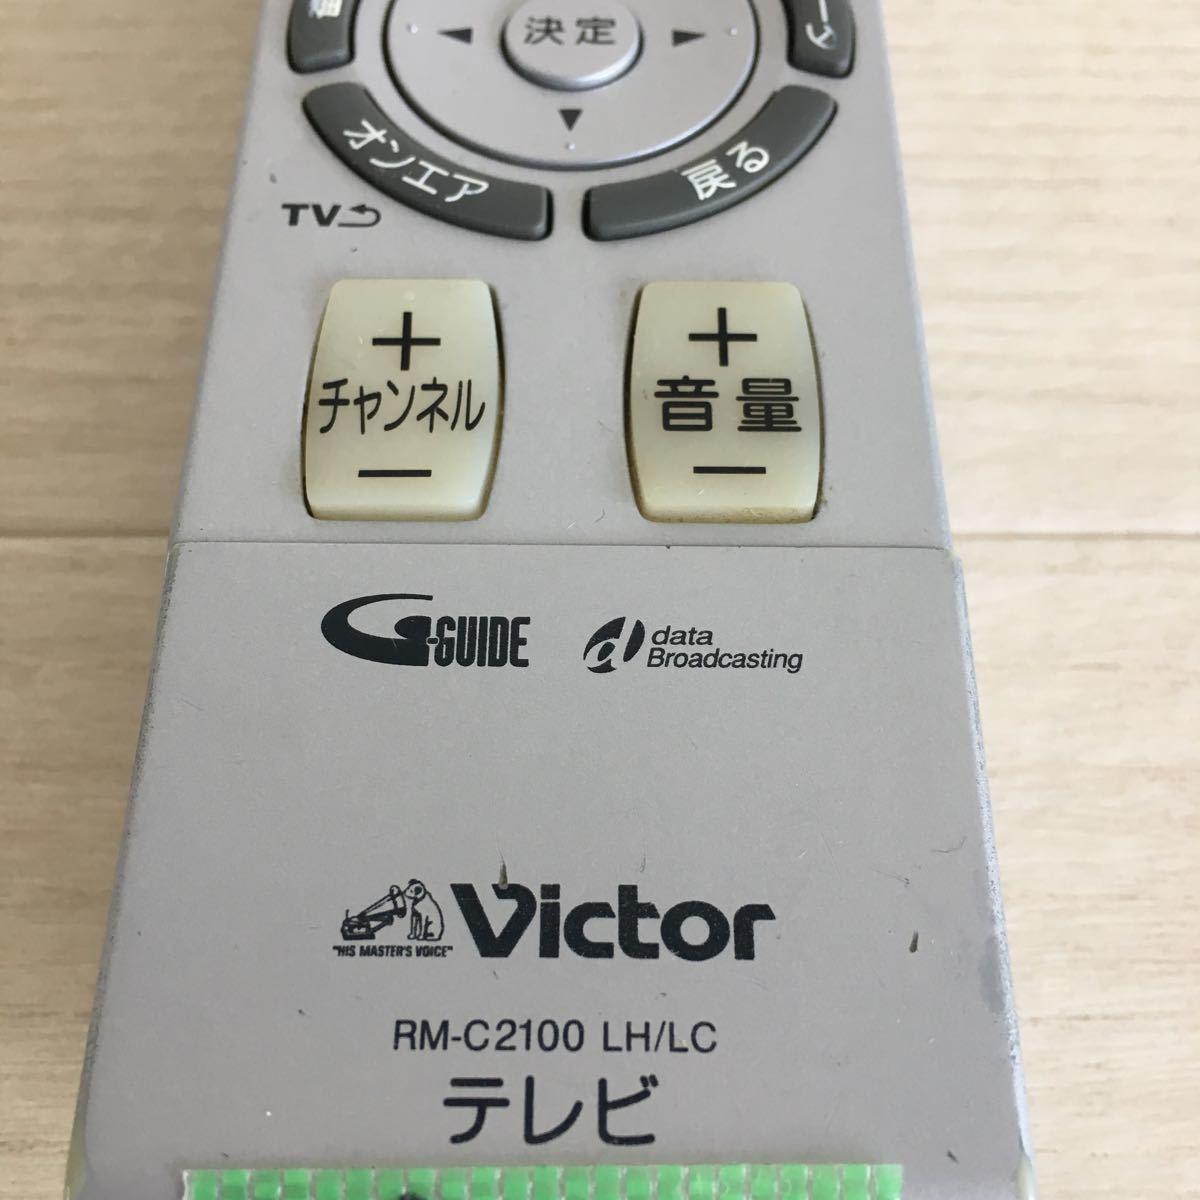 (H101)ビクター テレビリモコン RM-C2100 LH LC 送料無料_画像2